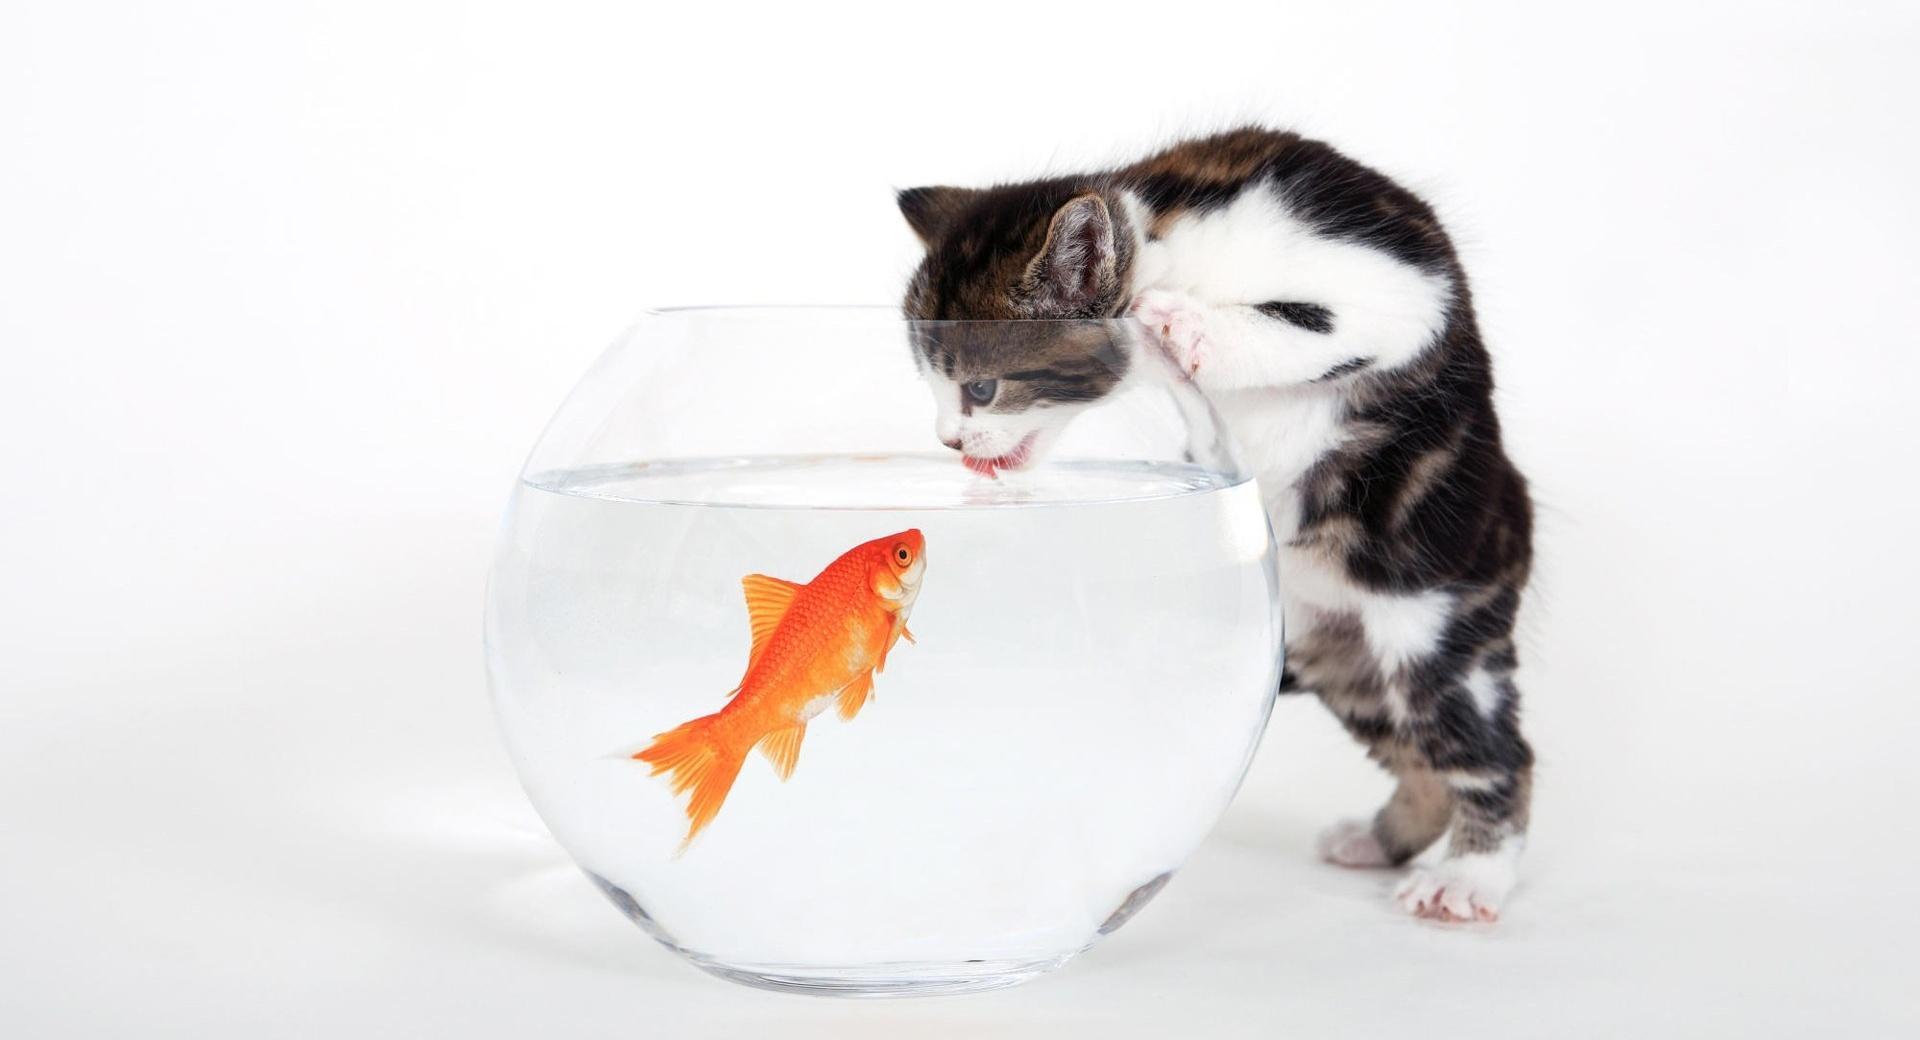 Kitten vs. Fish wallpapers HD quality